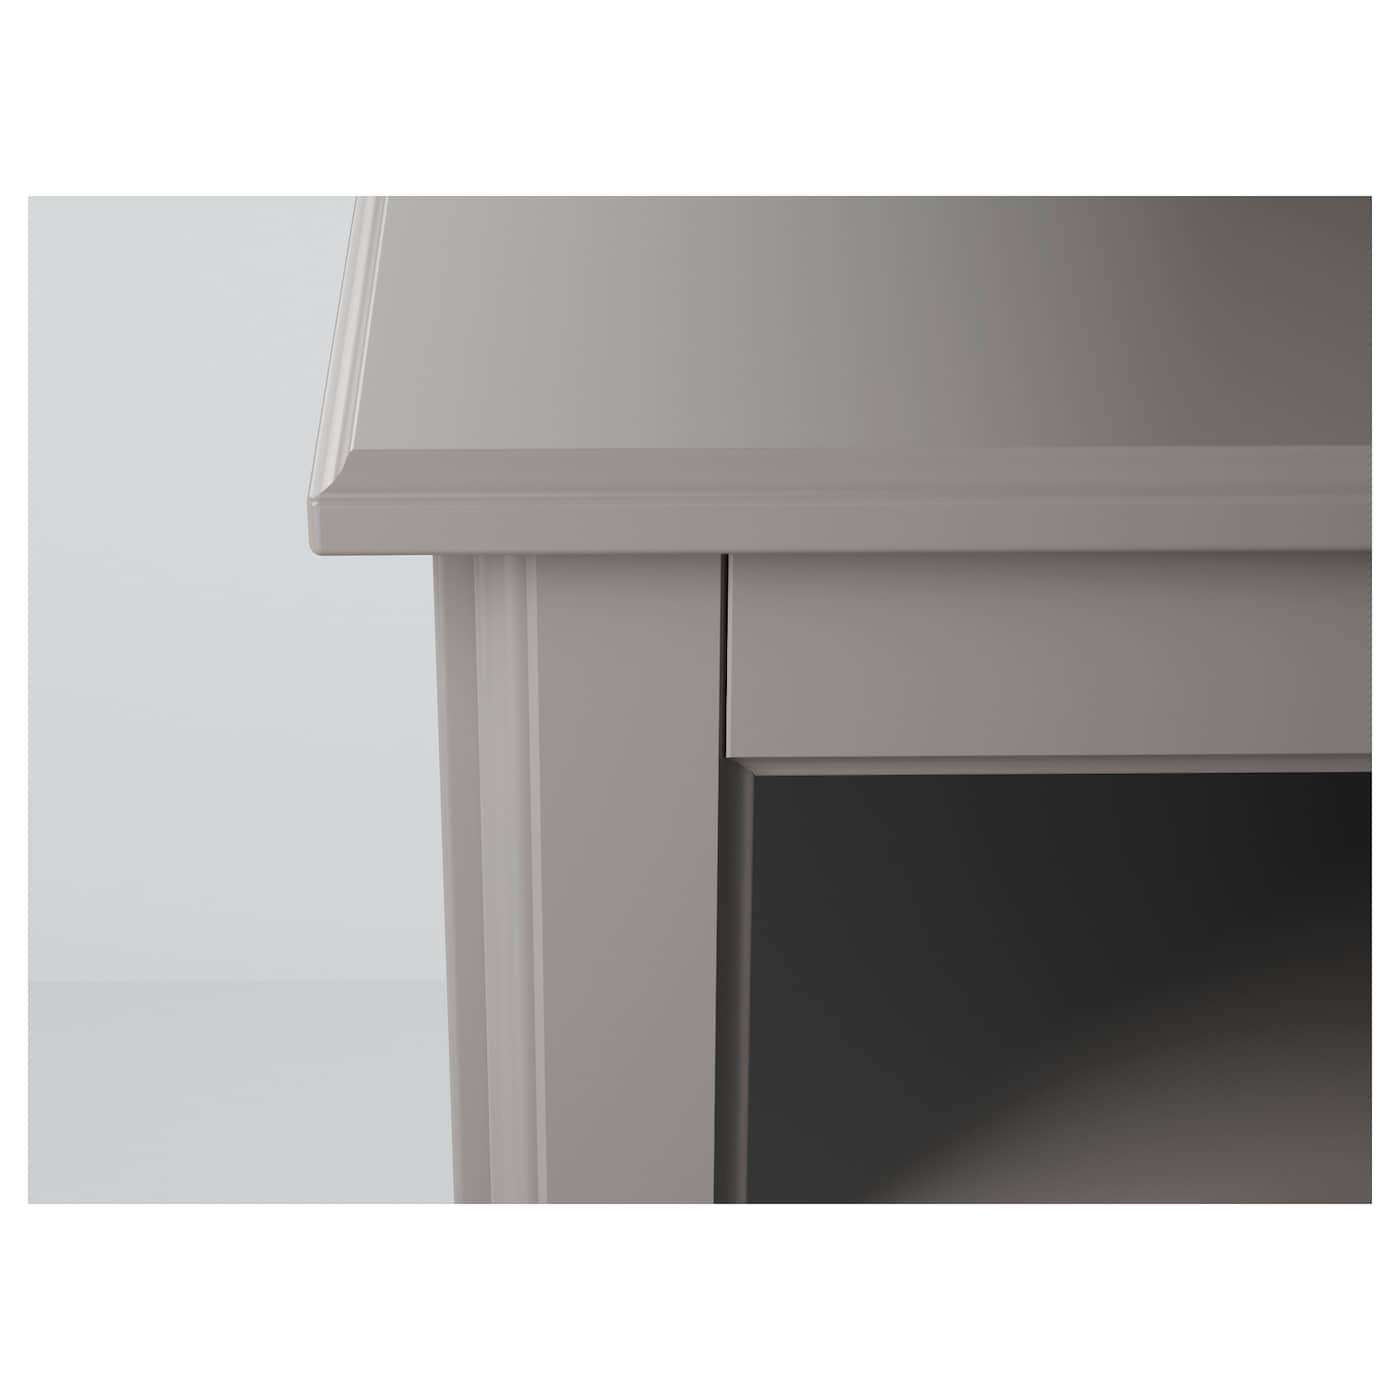 liatorp sideboard grey 145 x 87 cm ikea. Black Bedroom Furniture Sets. Home Design Ideas